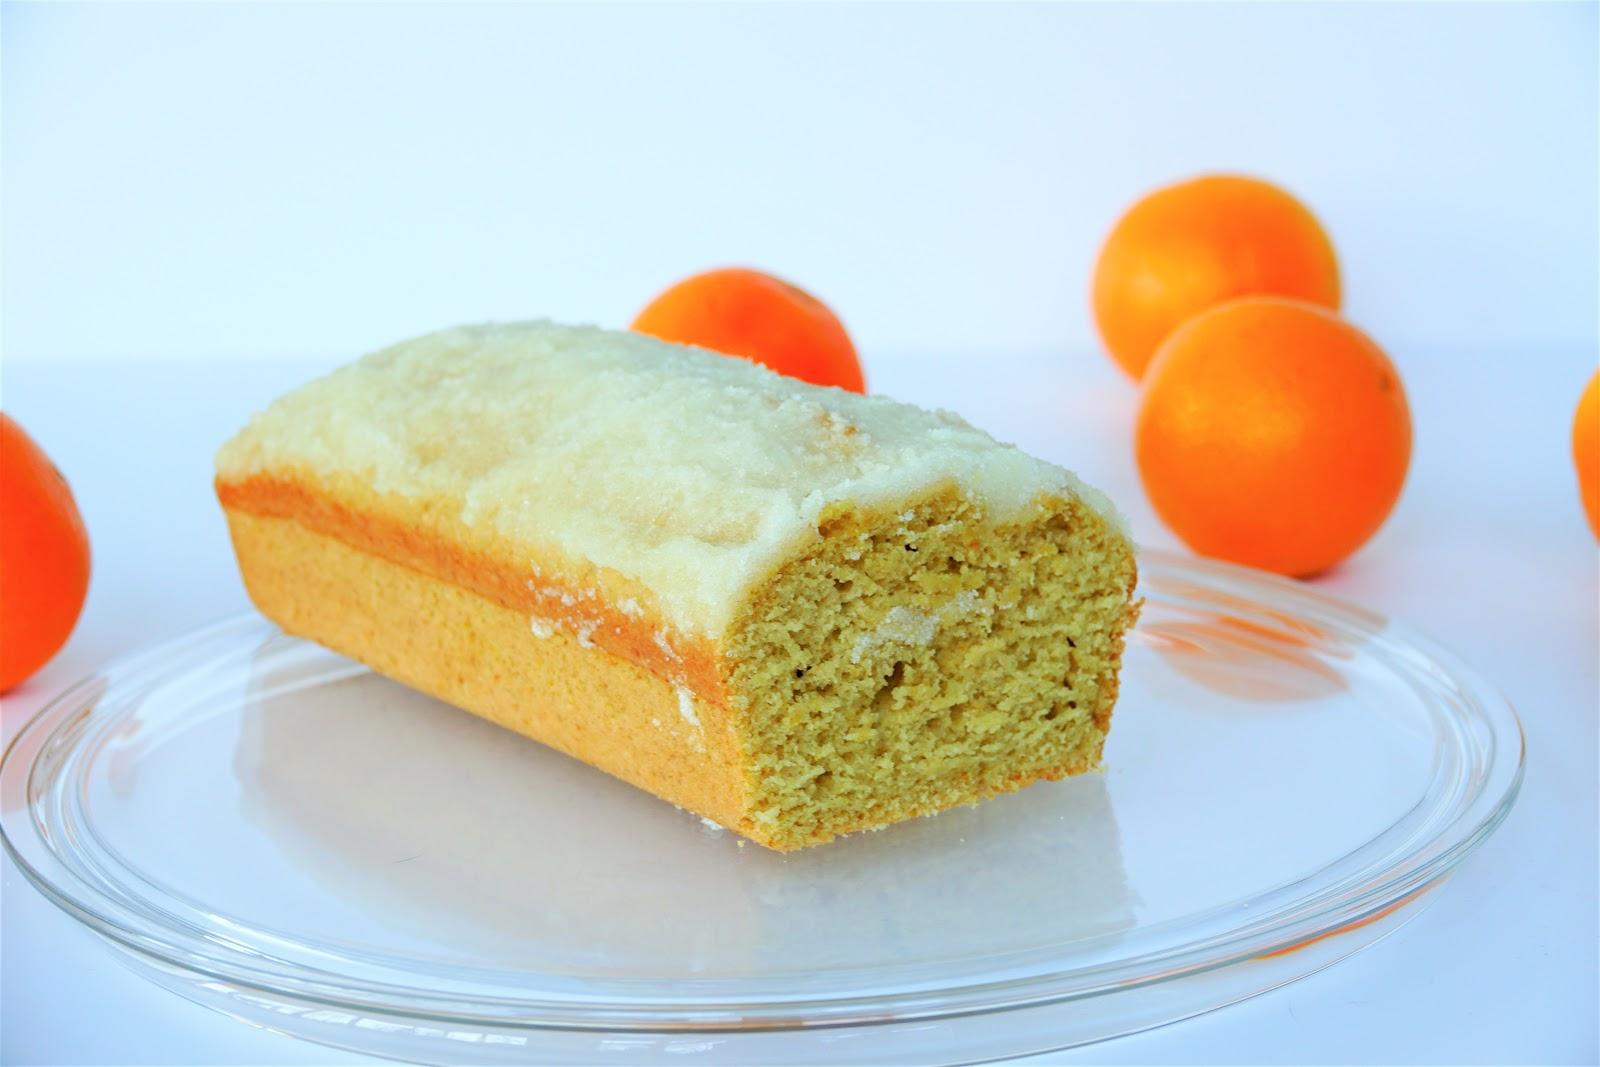 Vegan Go For It Saftiger Orangenkuchen